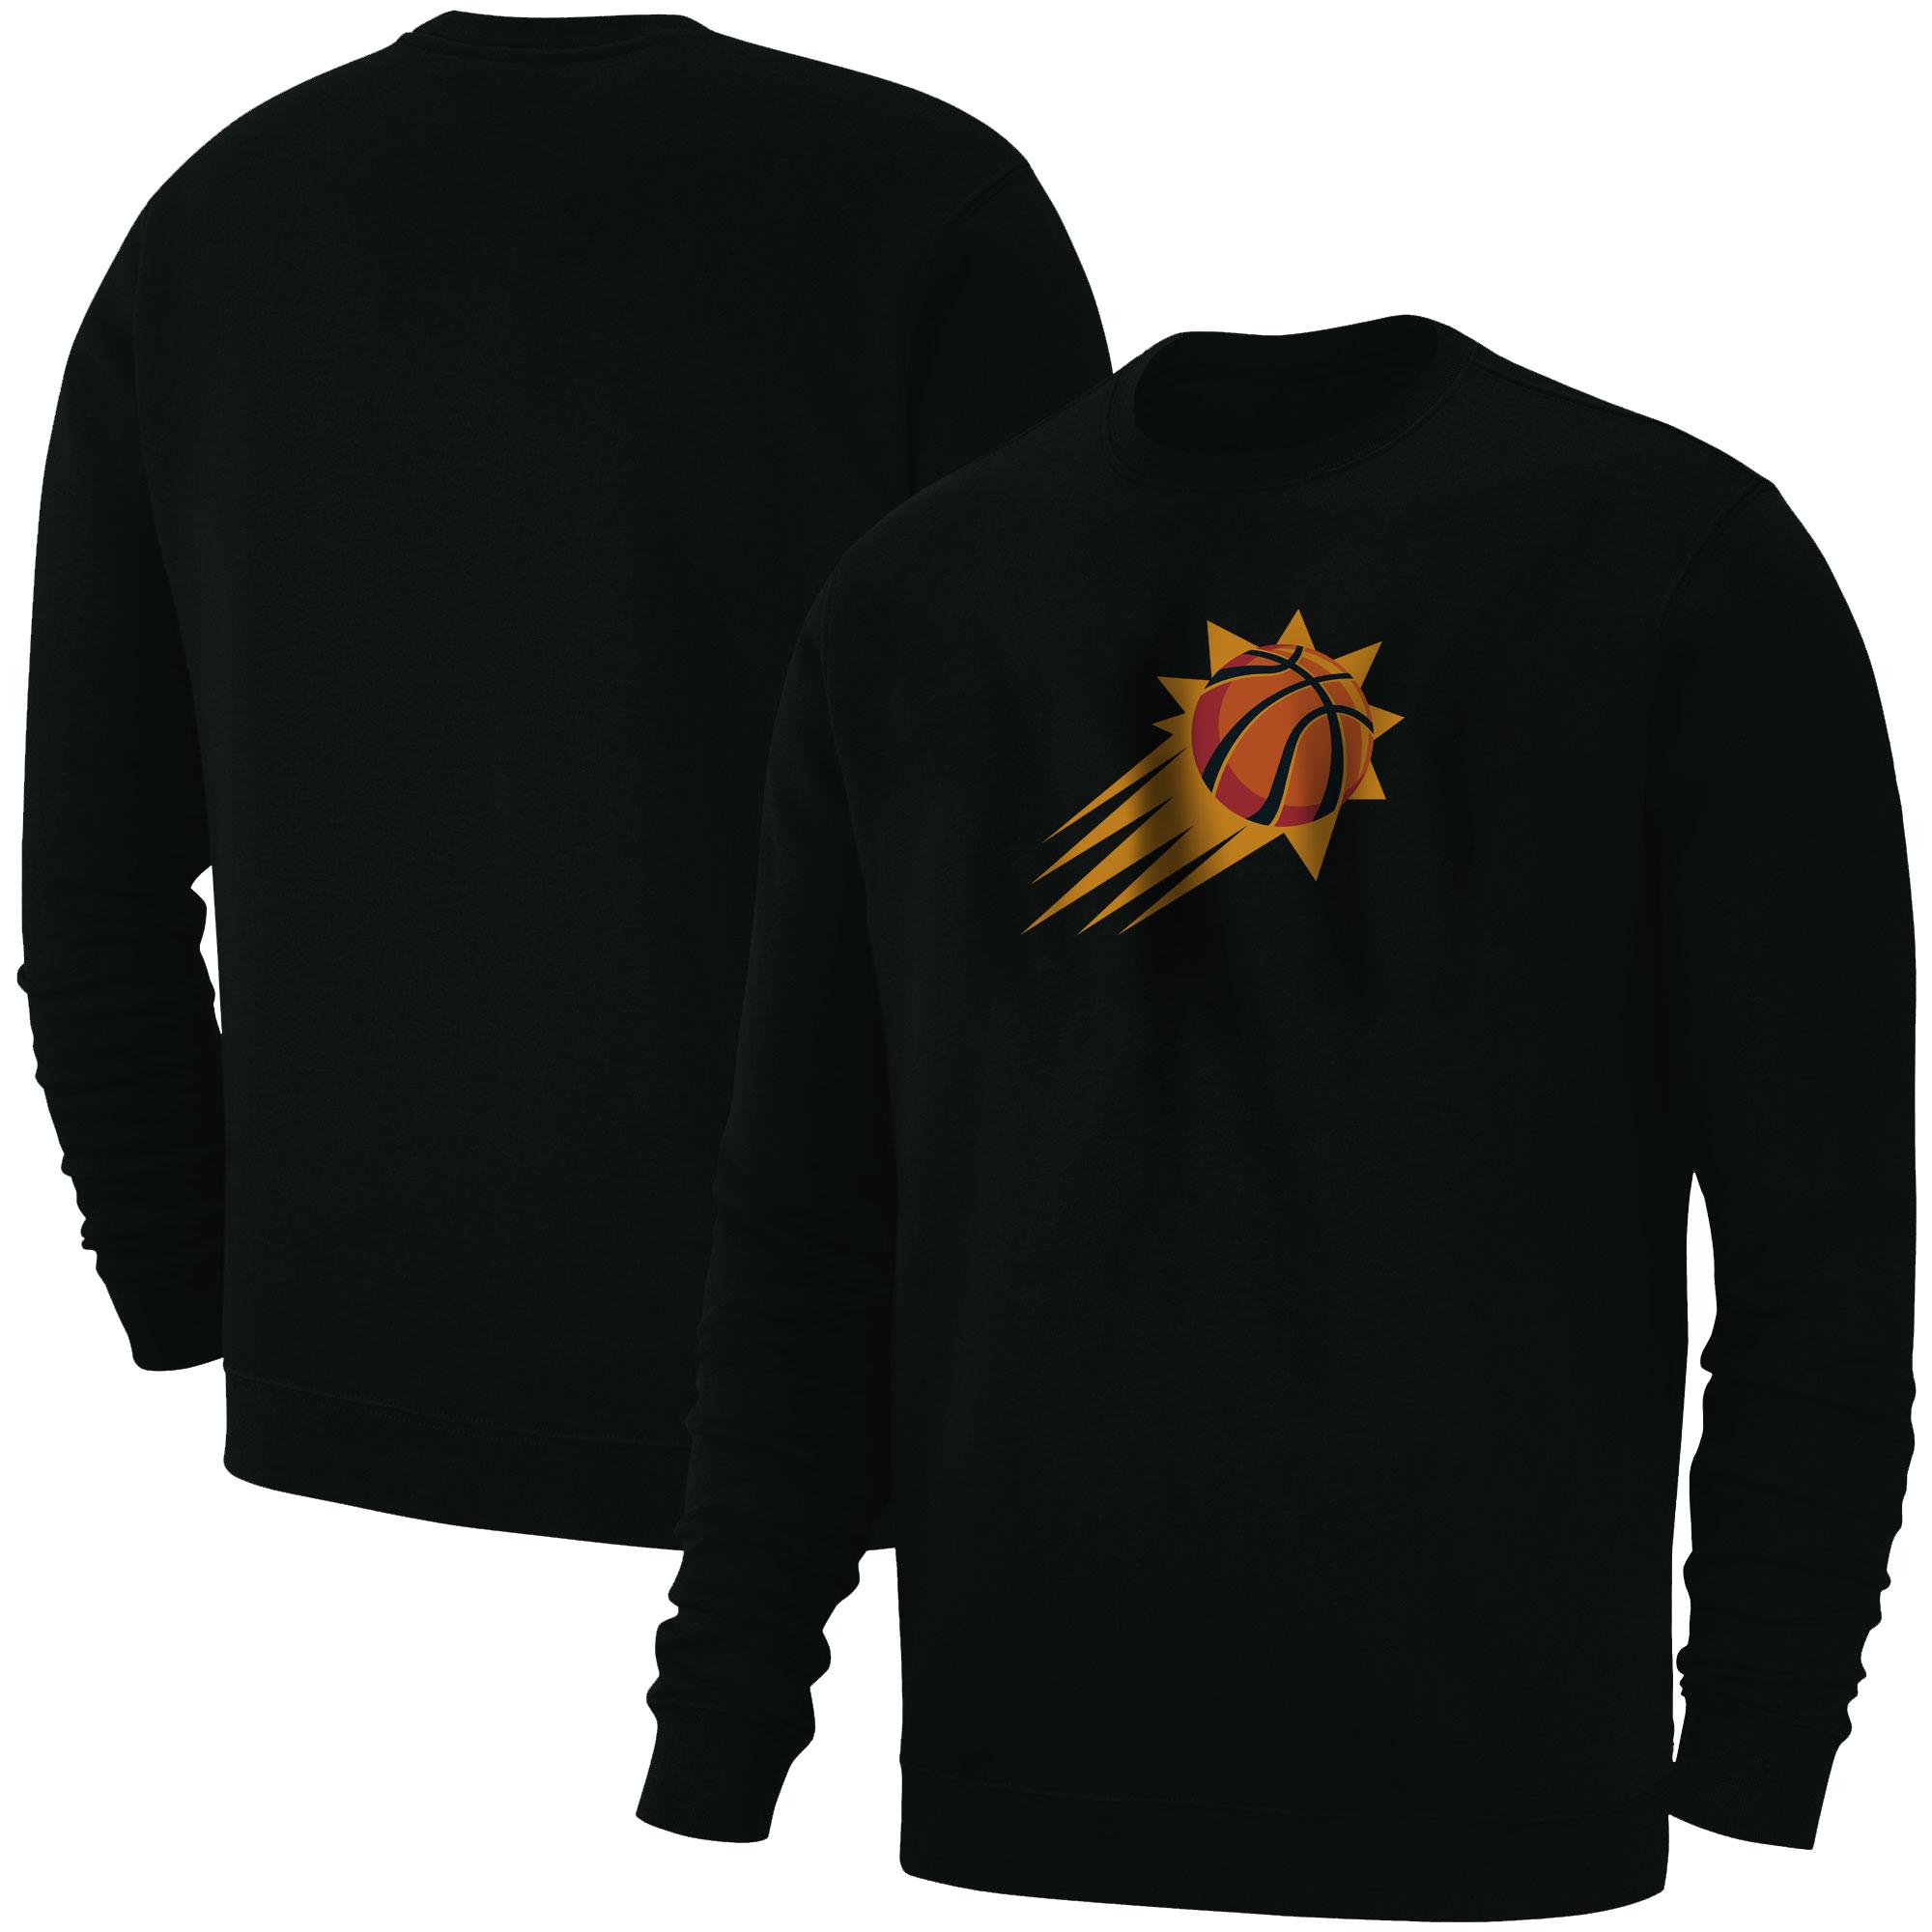 Phoenix Suns Basic (BSC-BLC-NP-406-NBA-PHO-SUNS-NEW)